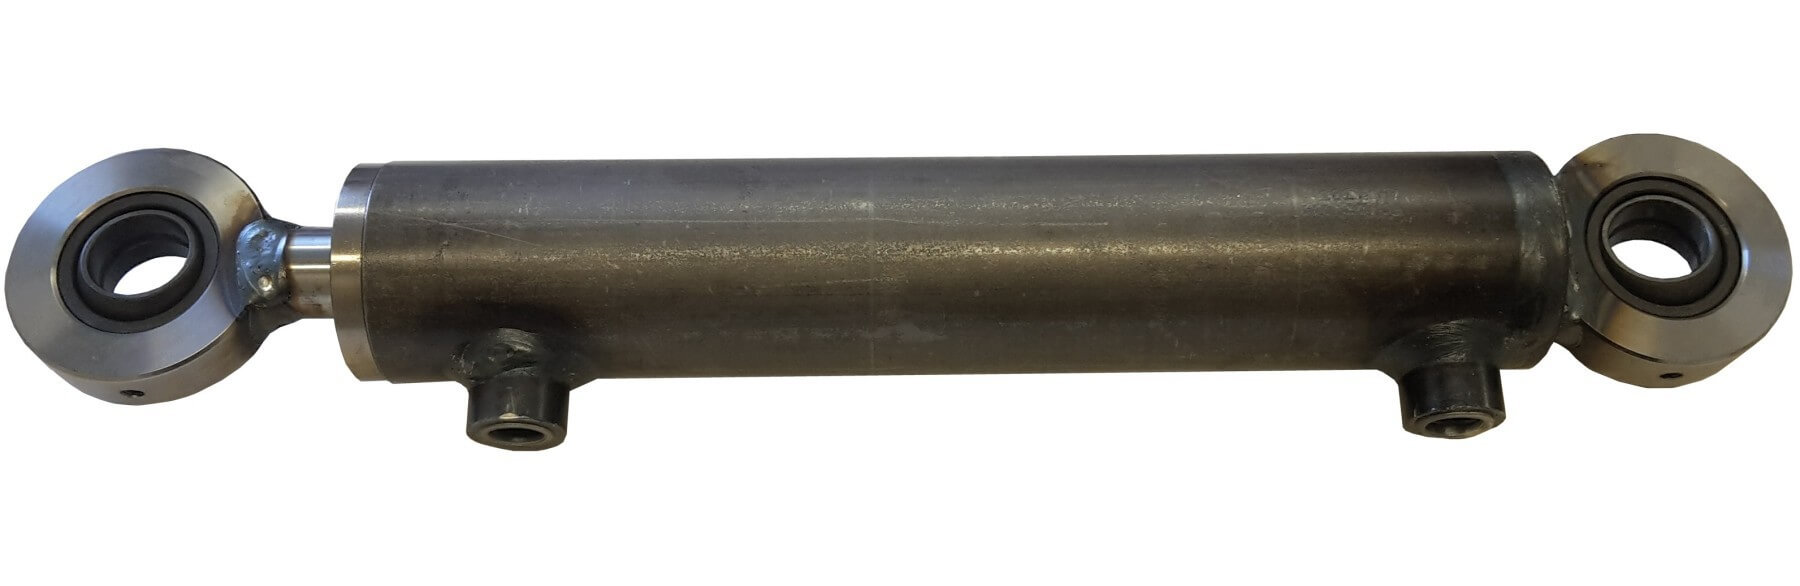 Hydraulisylinteri CL 32. 20. 300 GE